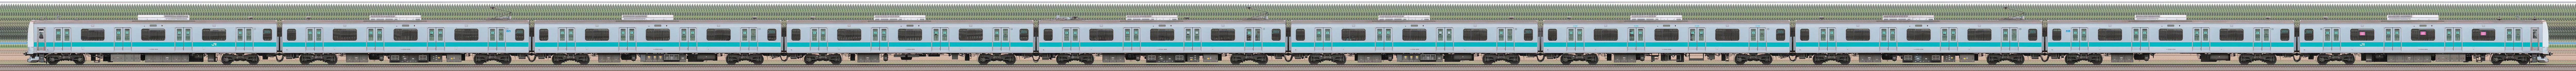 JR東日本 常磐緩行線 E233系2000番台マト18編成(線路設備モニタリング装置対応編成・山側)の編成サイドビュー